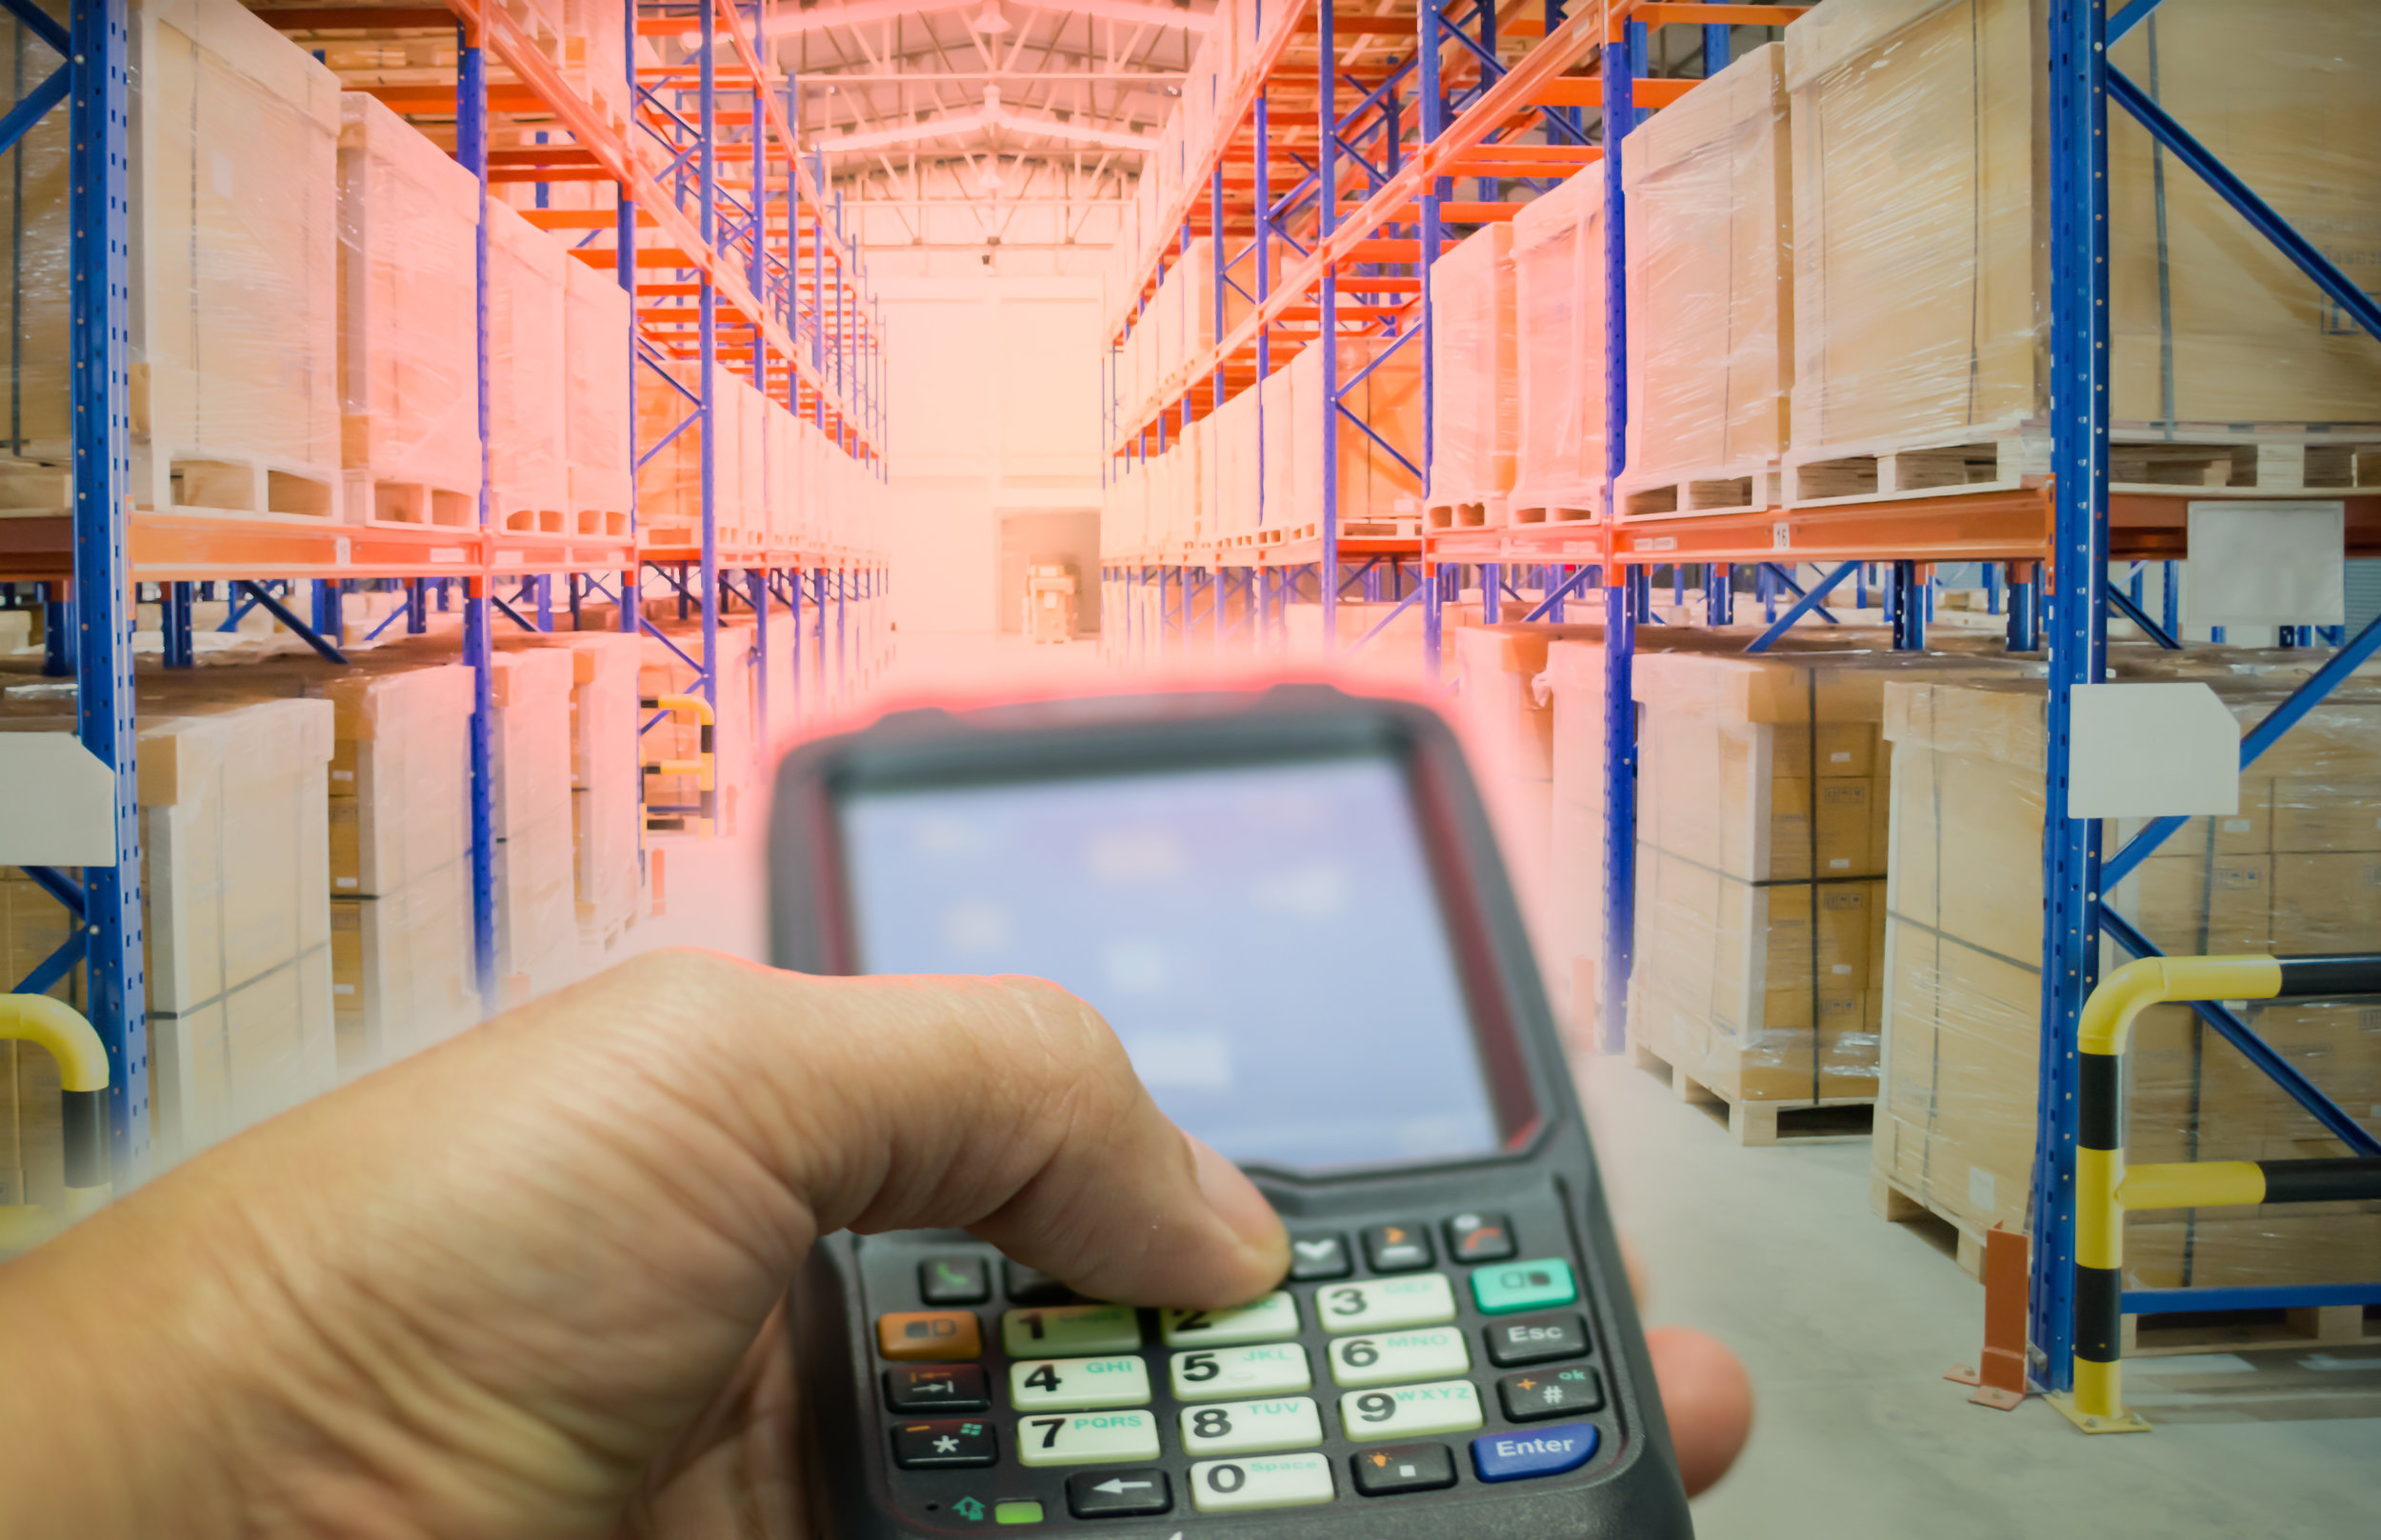 Warehousing image.jpg